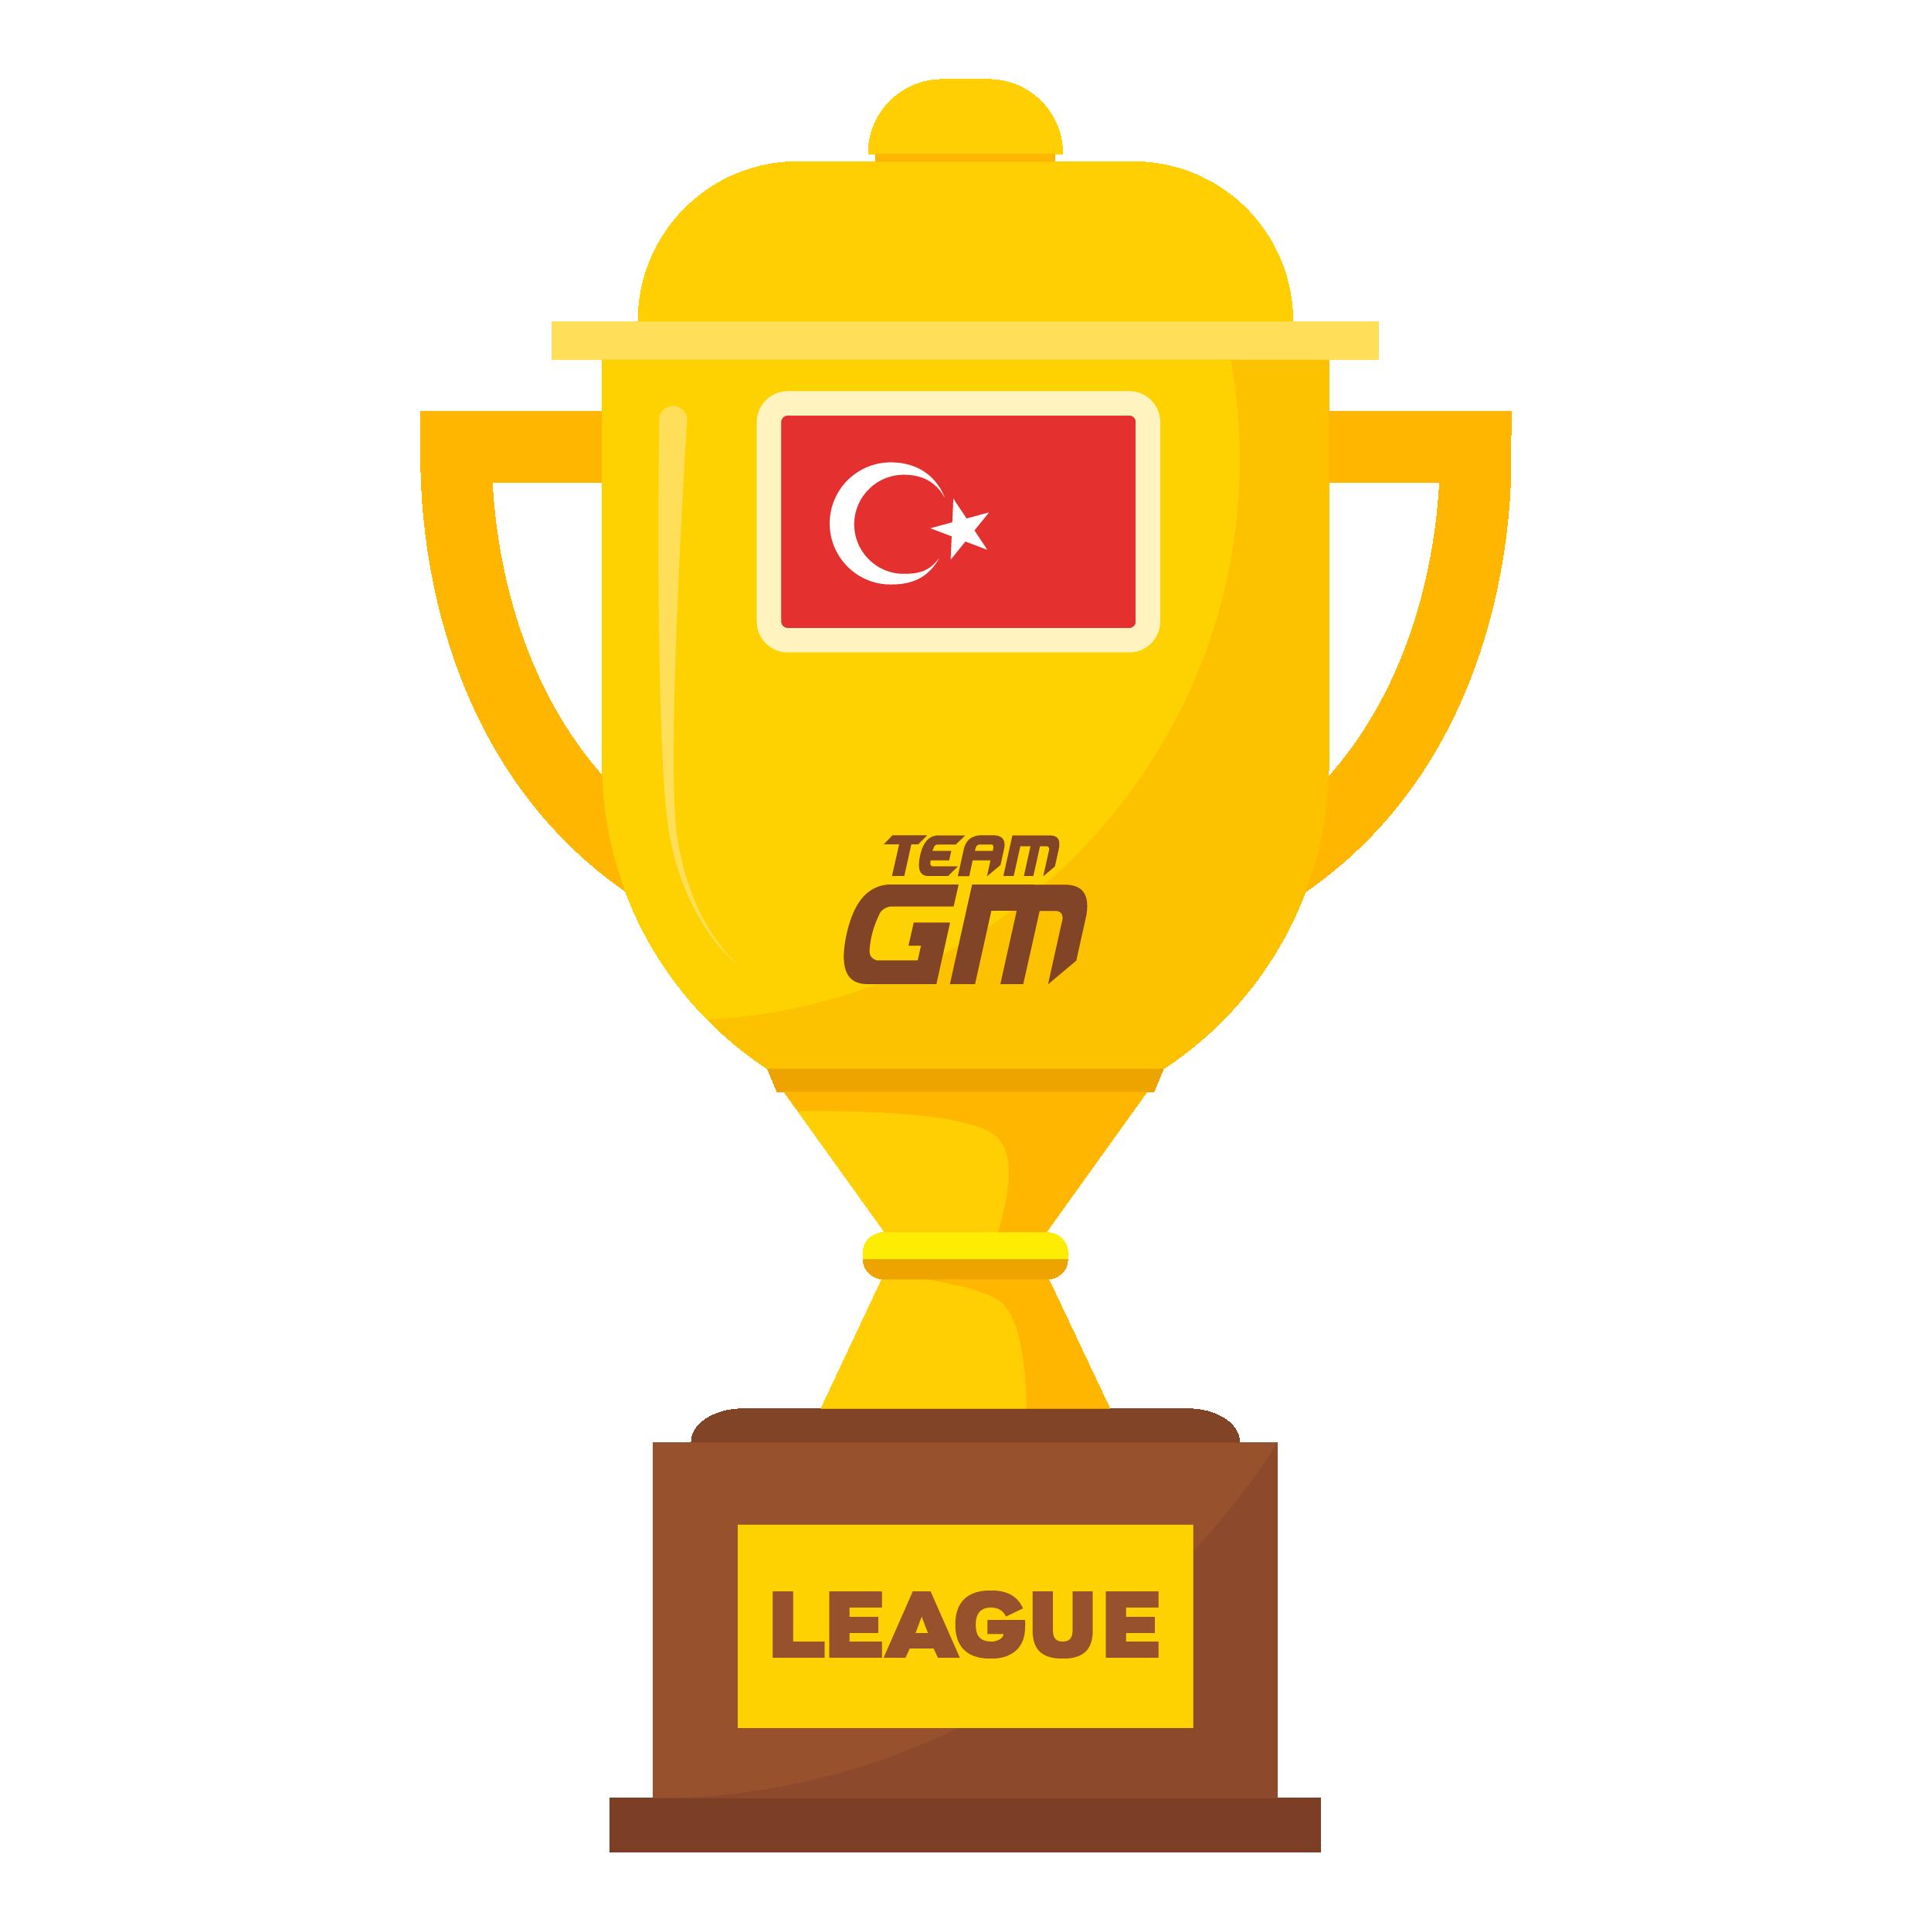 2ND - TURKISH LEAGUE